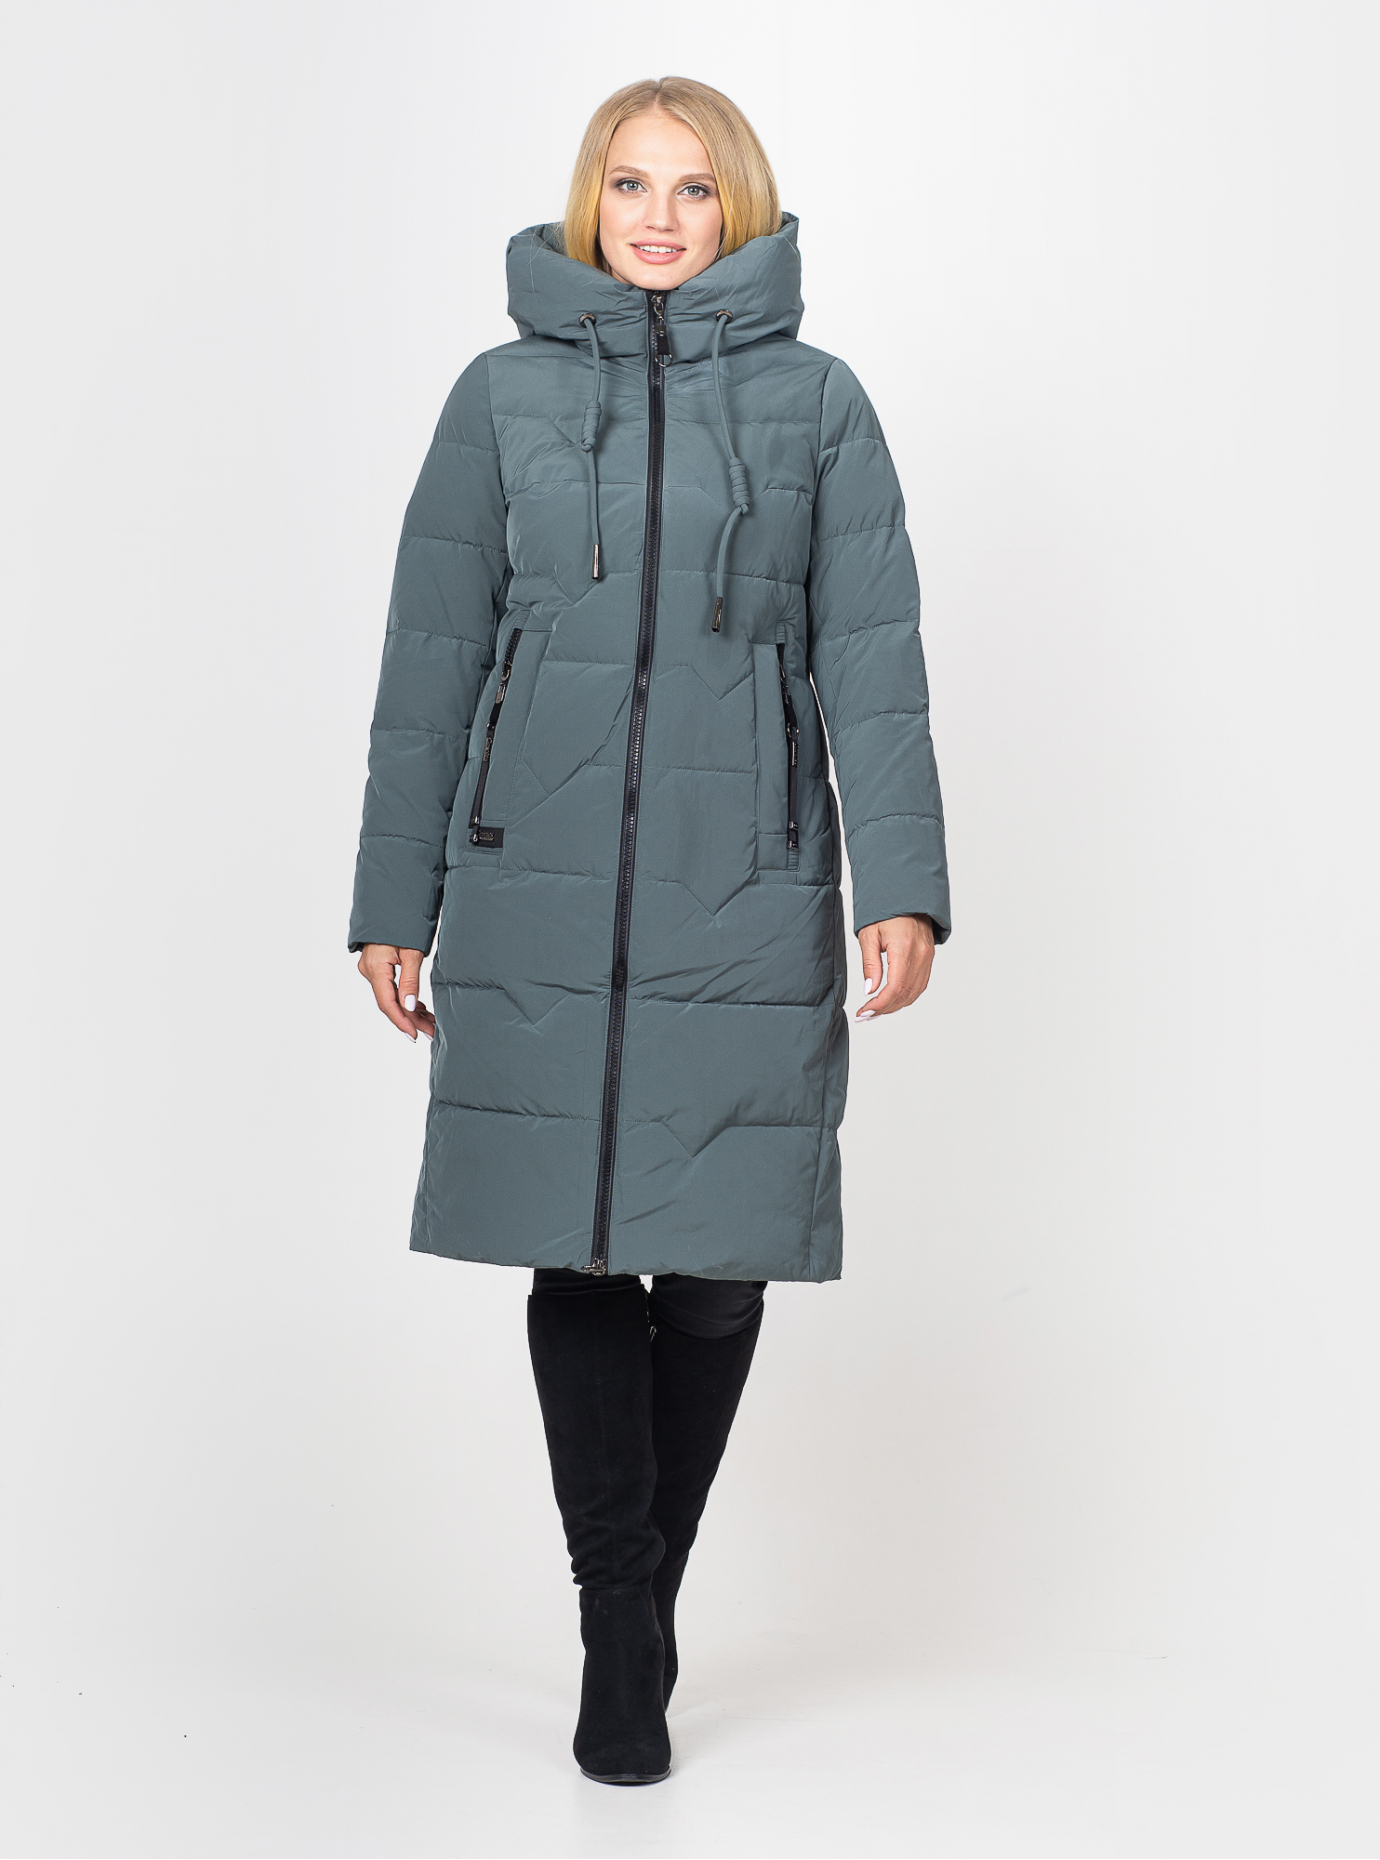 Куртка зимова жіноча довга Смарагд L (07-VP201383): фото - Alster.ua